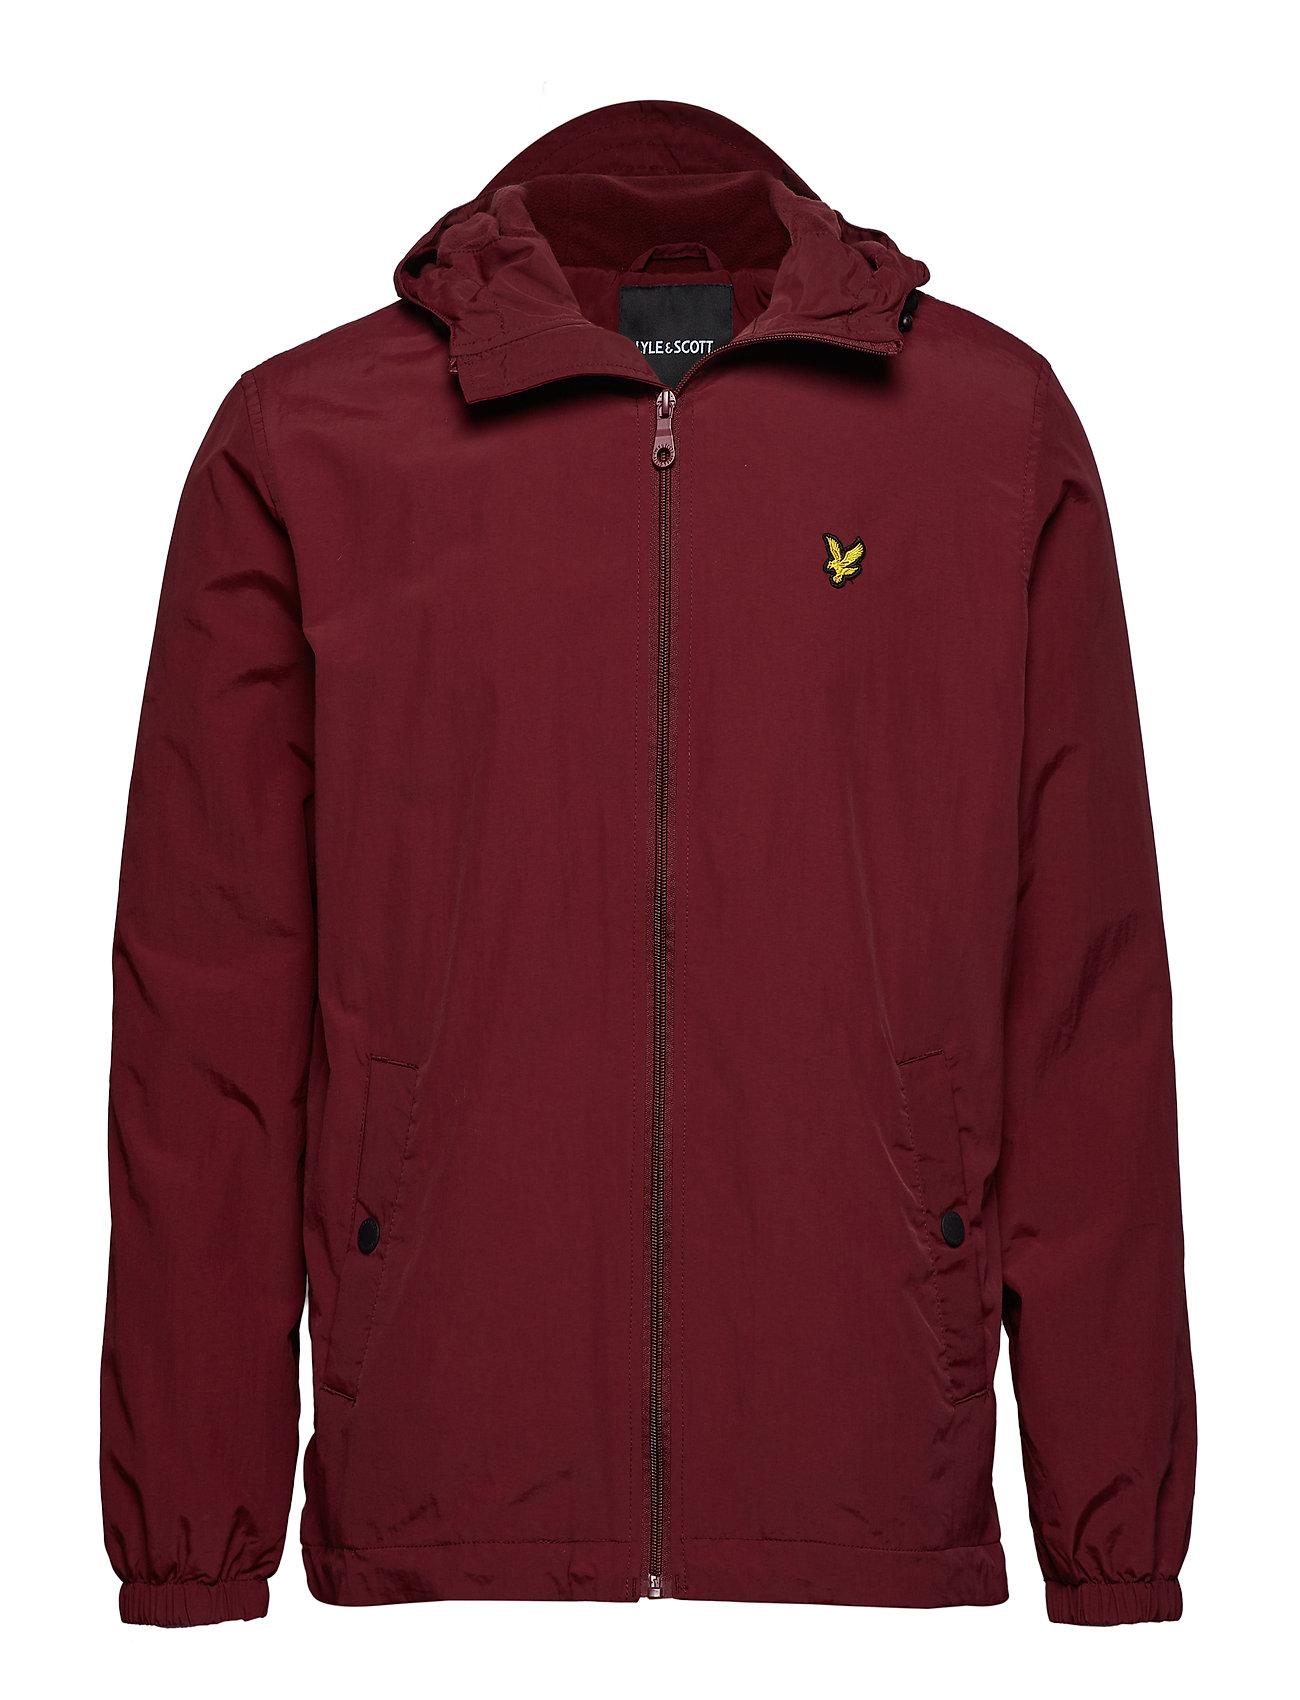 Lyle & Scott Microfleece Lined Zip Through Jacket